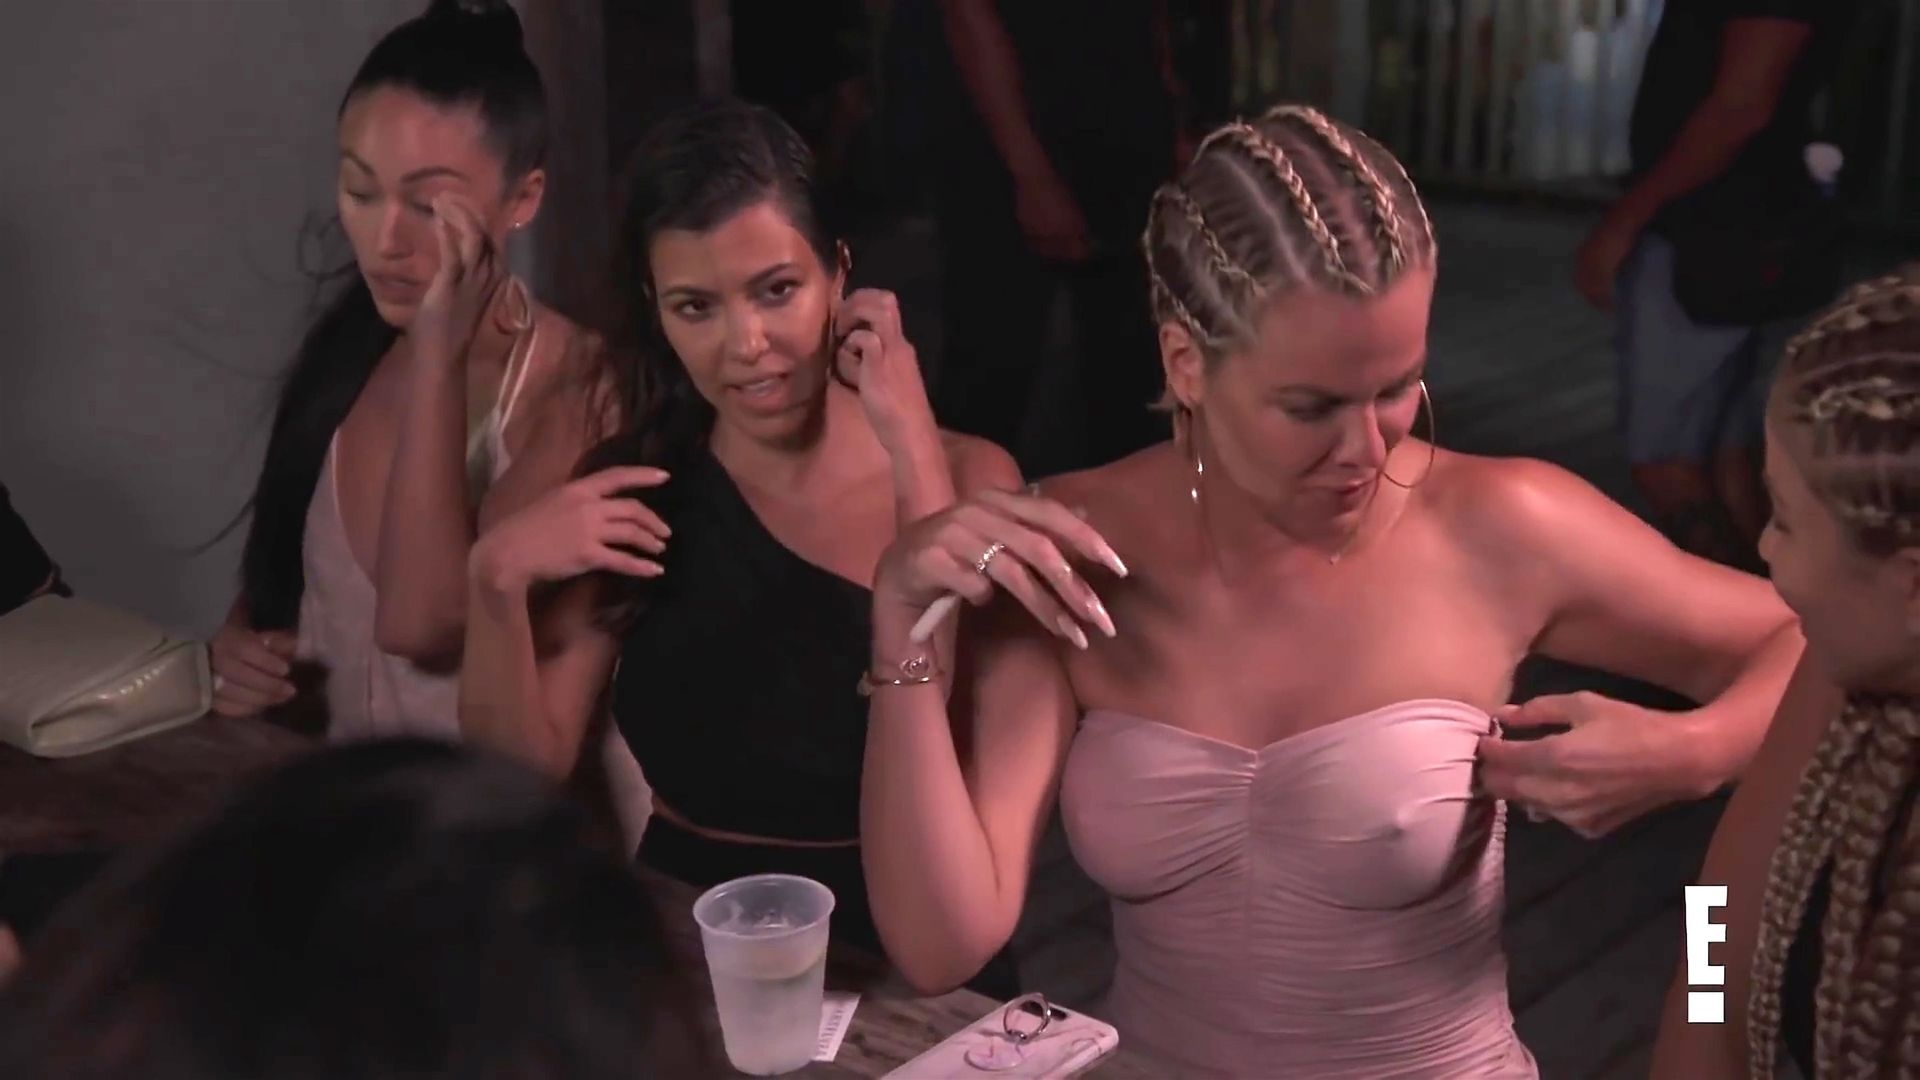 Khloé Kardashian Gets A Little Cold Without A Bra 0012